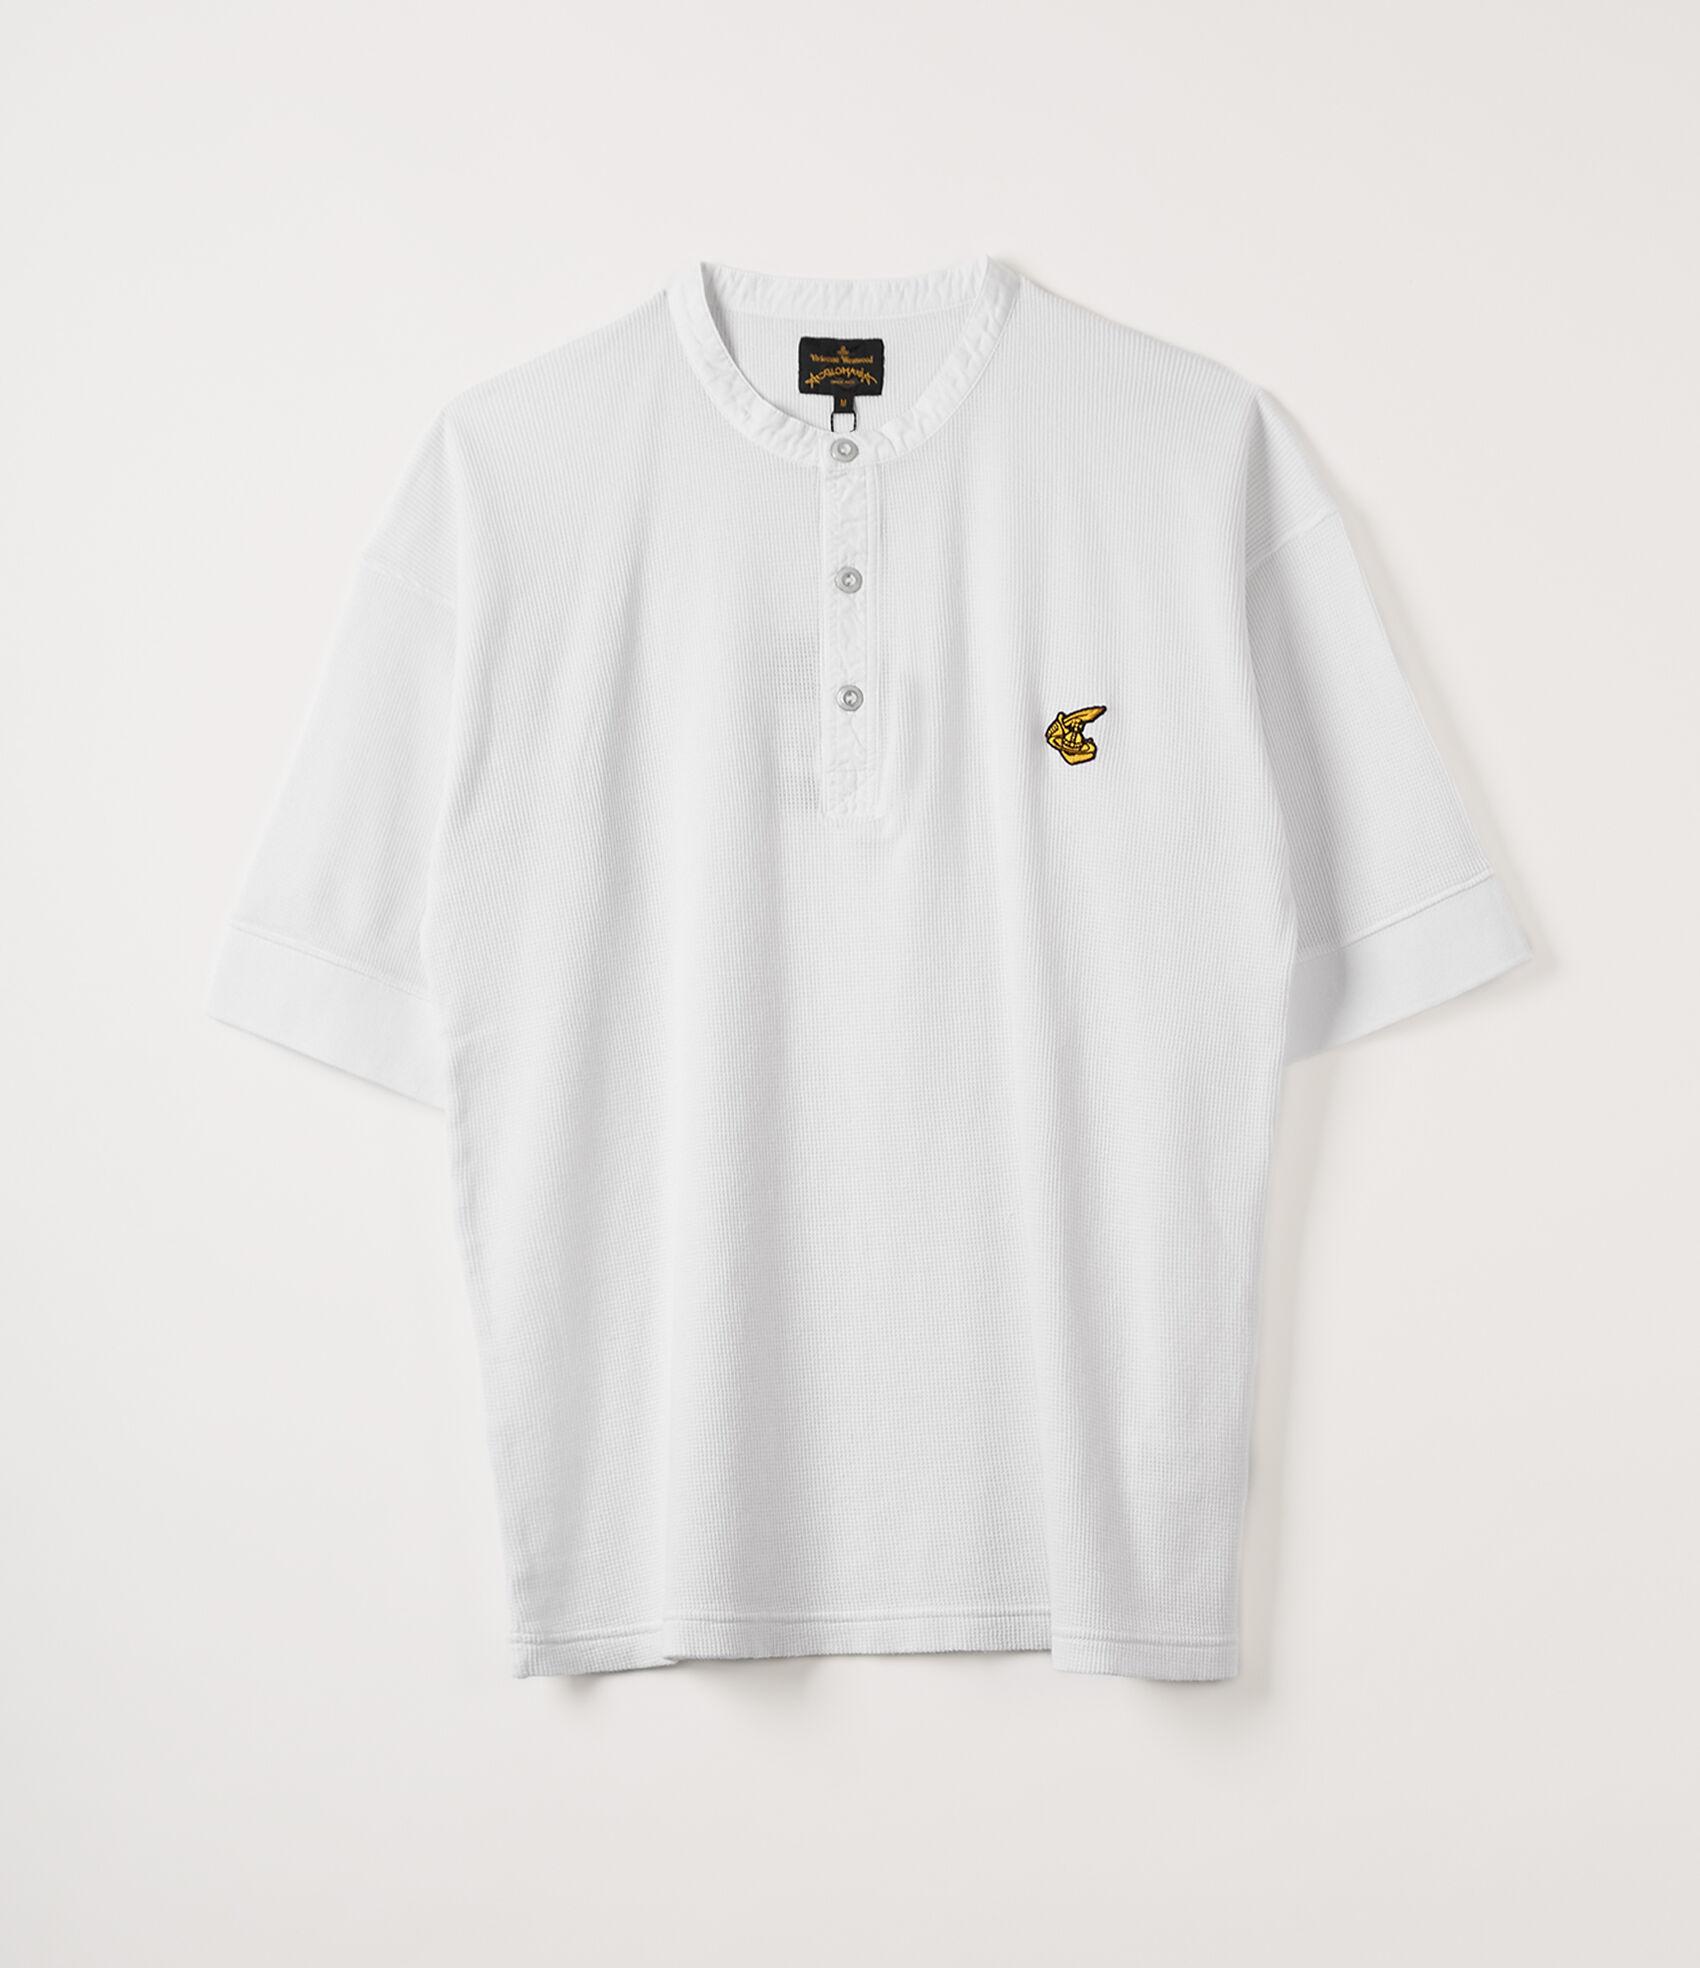 24abaca7 Short Sleeve Grandad T-Shirt White